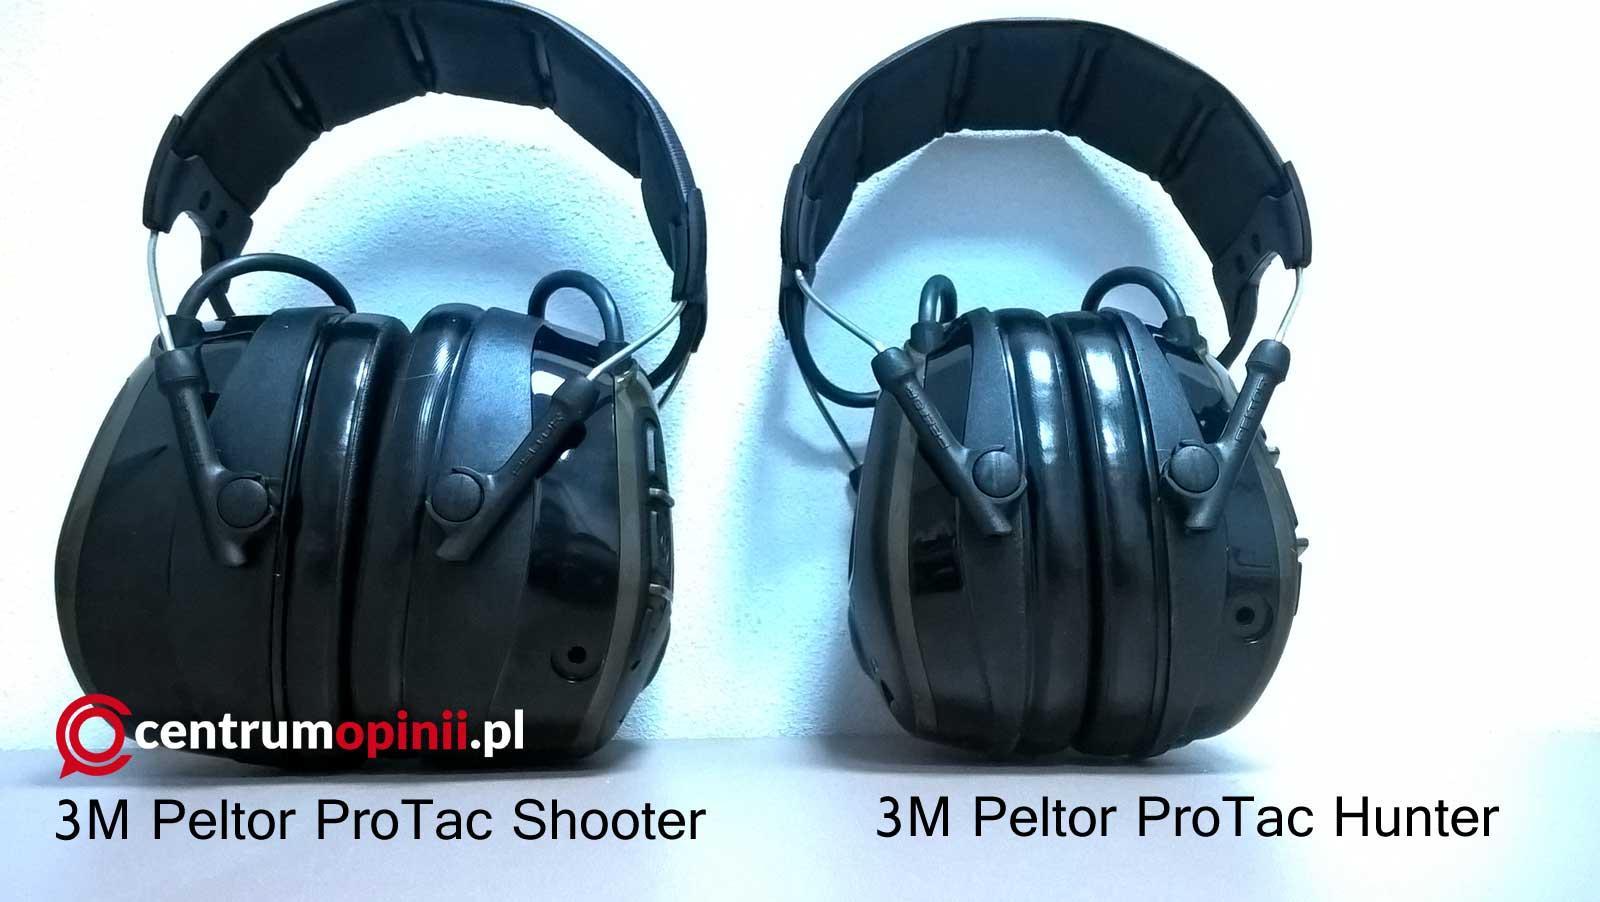 Słuchawki Peltor ProTac Hunter oraz ProTac Shooter porównanie.